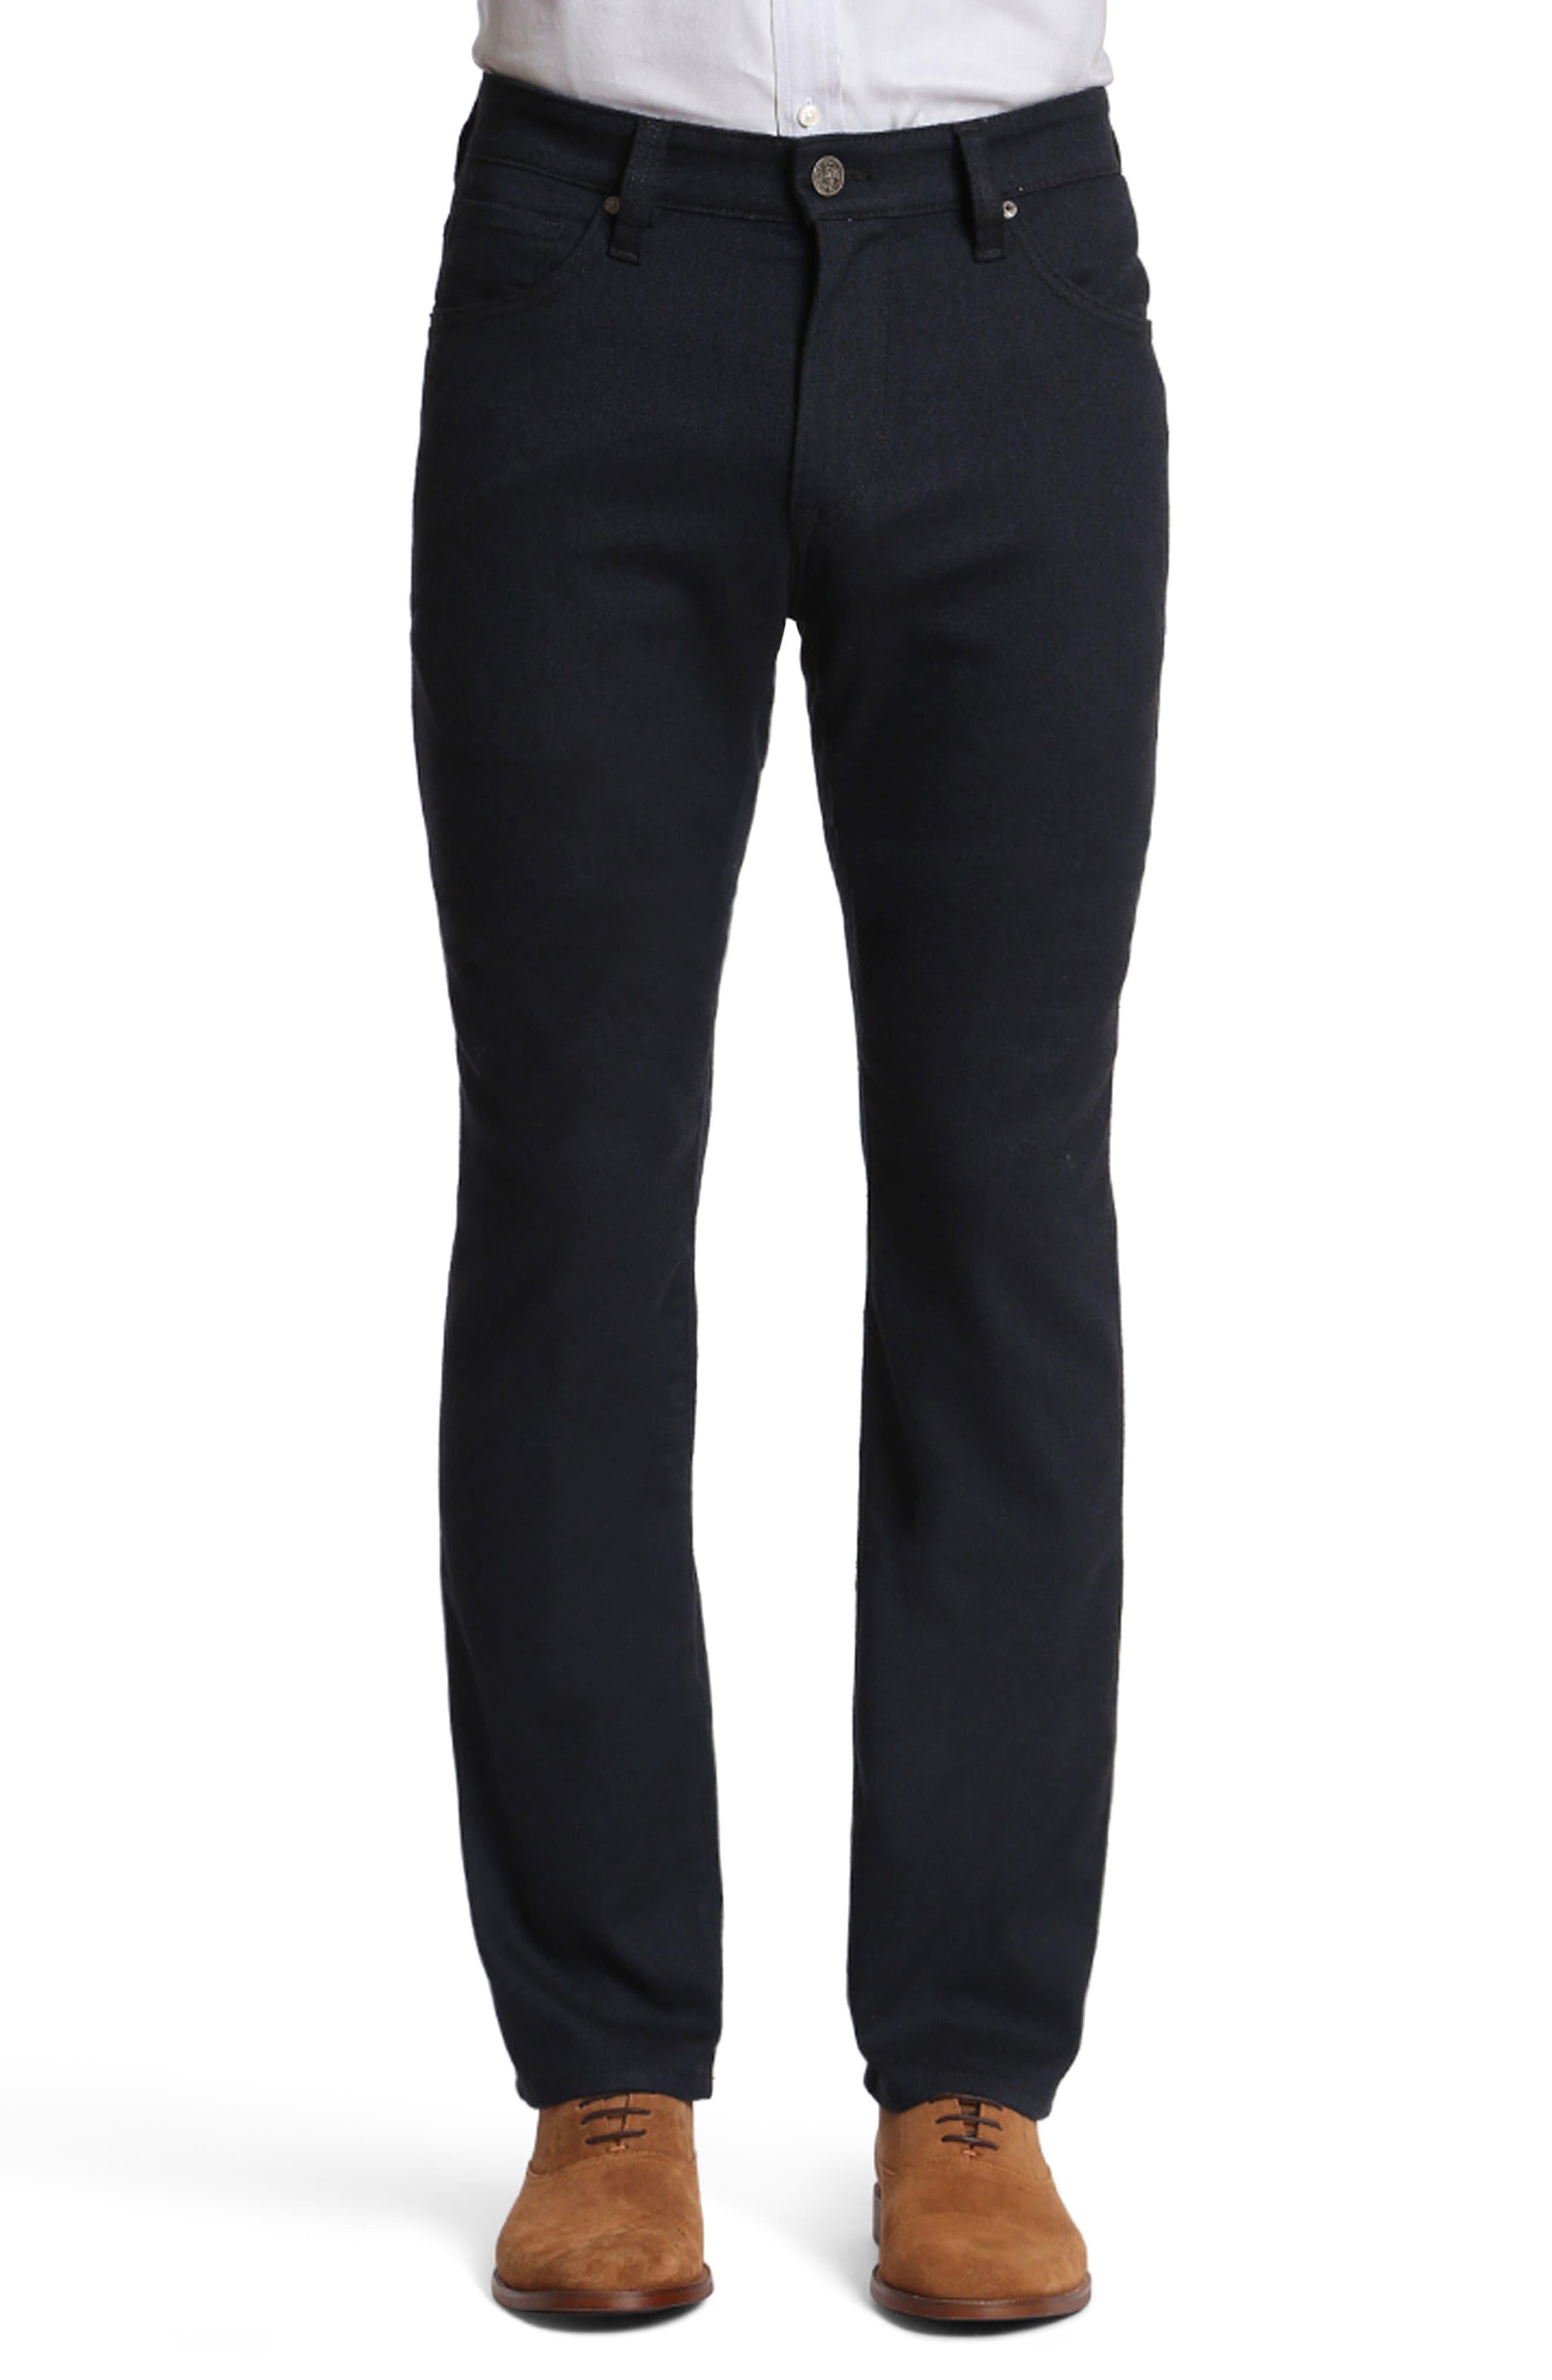 Alternate Image 1 Selected - 34 Heritage Courage Straight Leg Tweed Pants